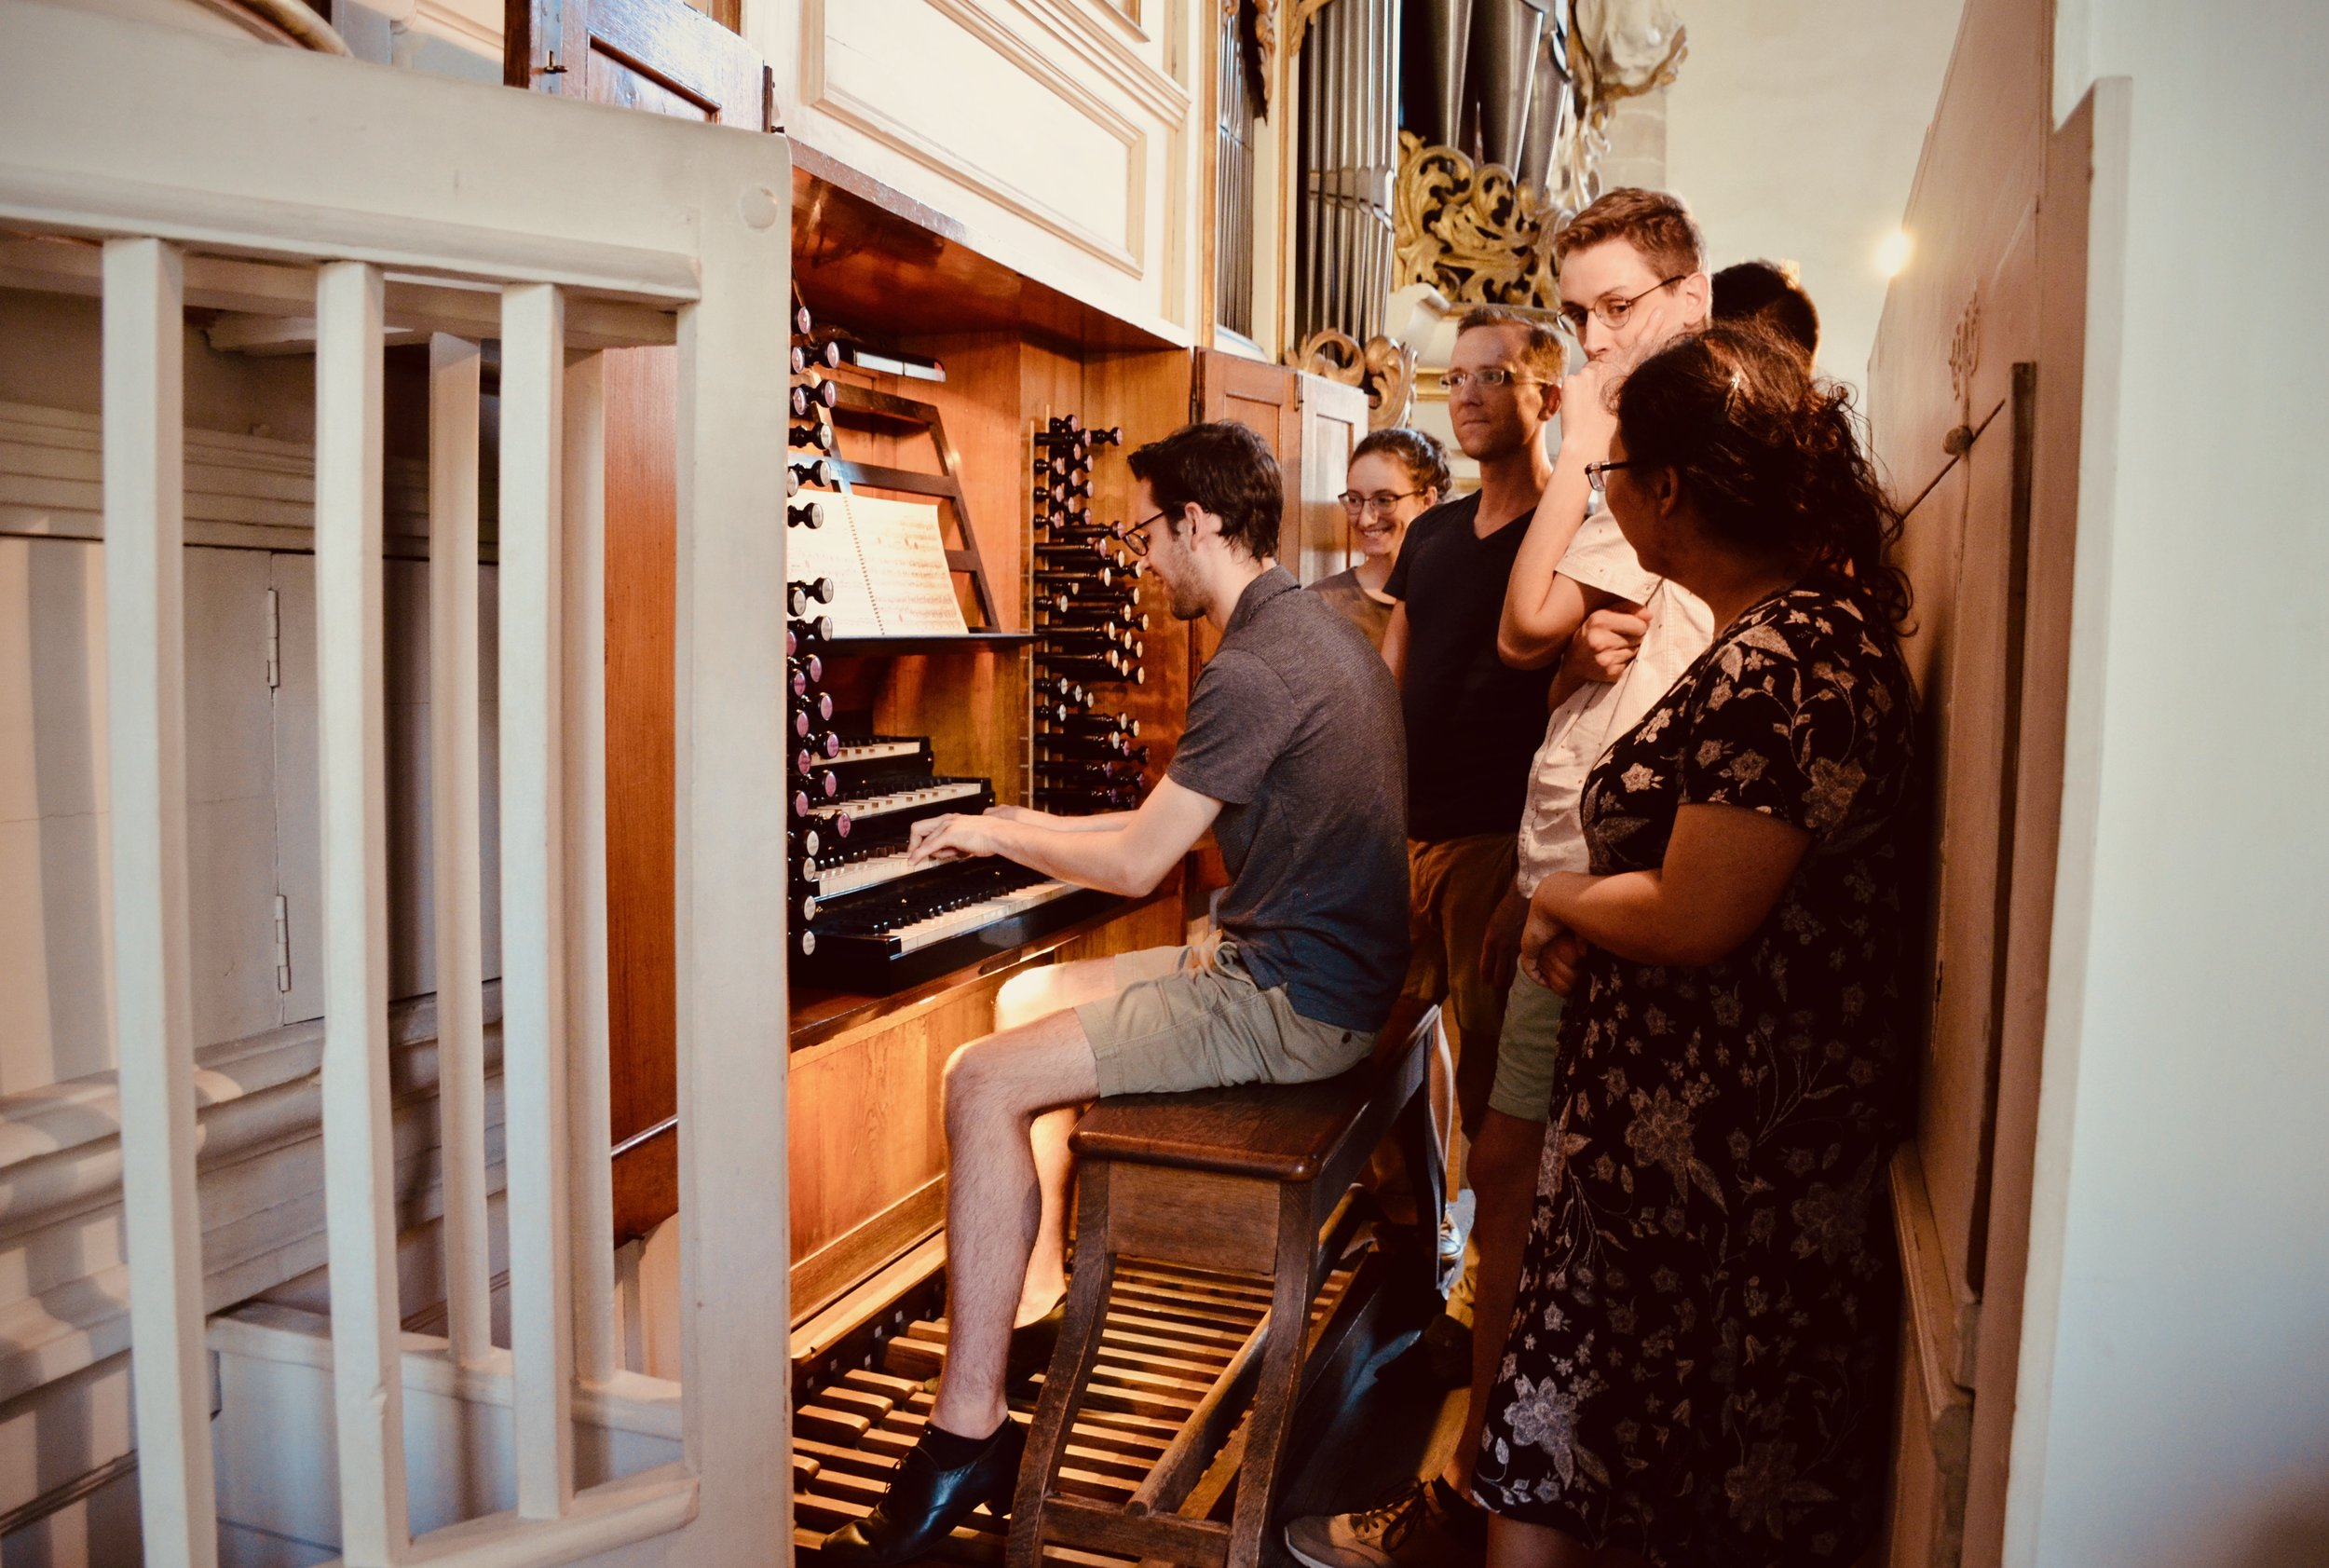 Nick Capozzoli plays the 1855 Ladegast Organ, Merseburg Dom.